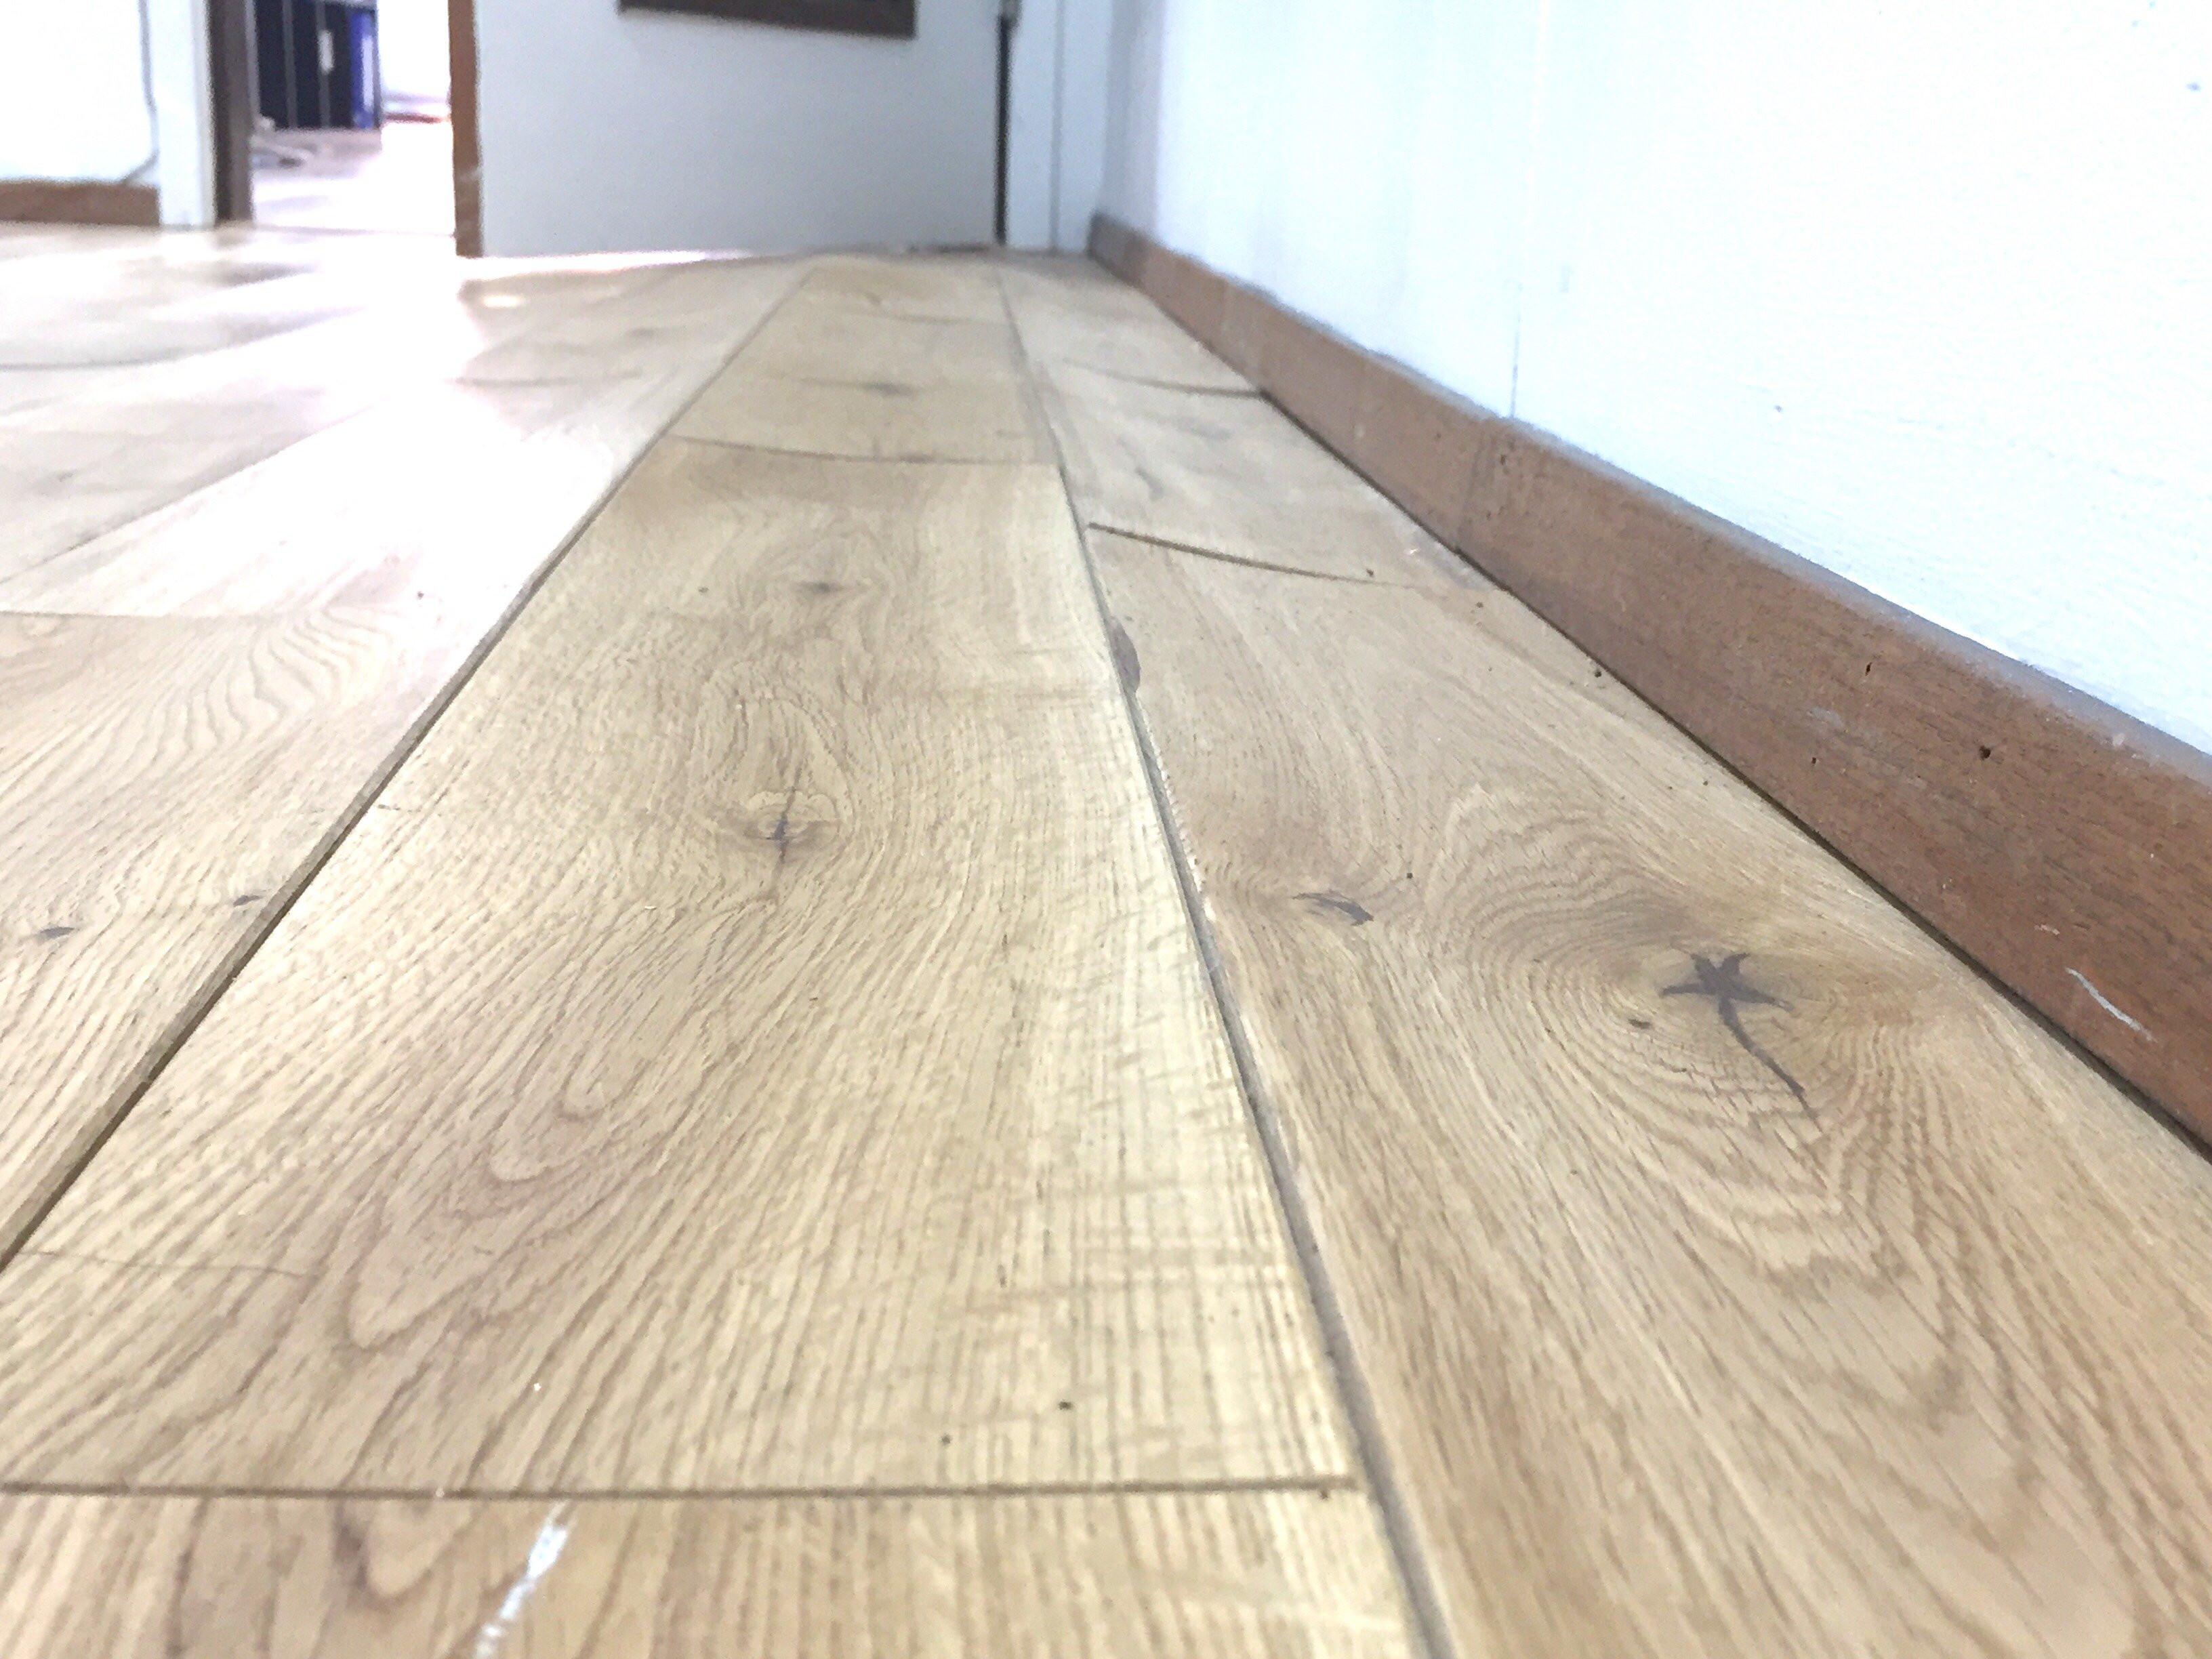 humidity for hardwood floors of hardwood floor cupping hardwood floor refinishing project how long intended for hardwood floor cupping 5 proven hardwood floor thickness categories easiklip floors